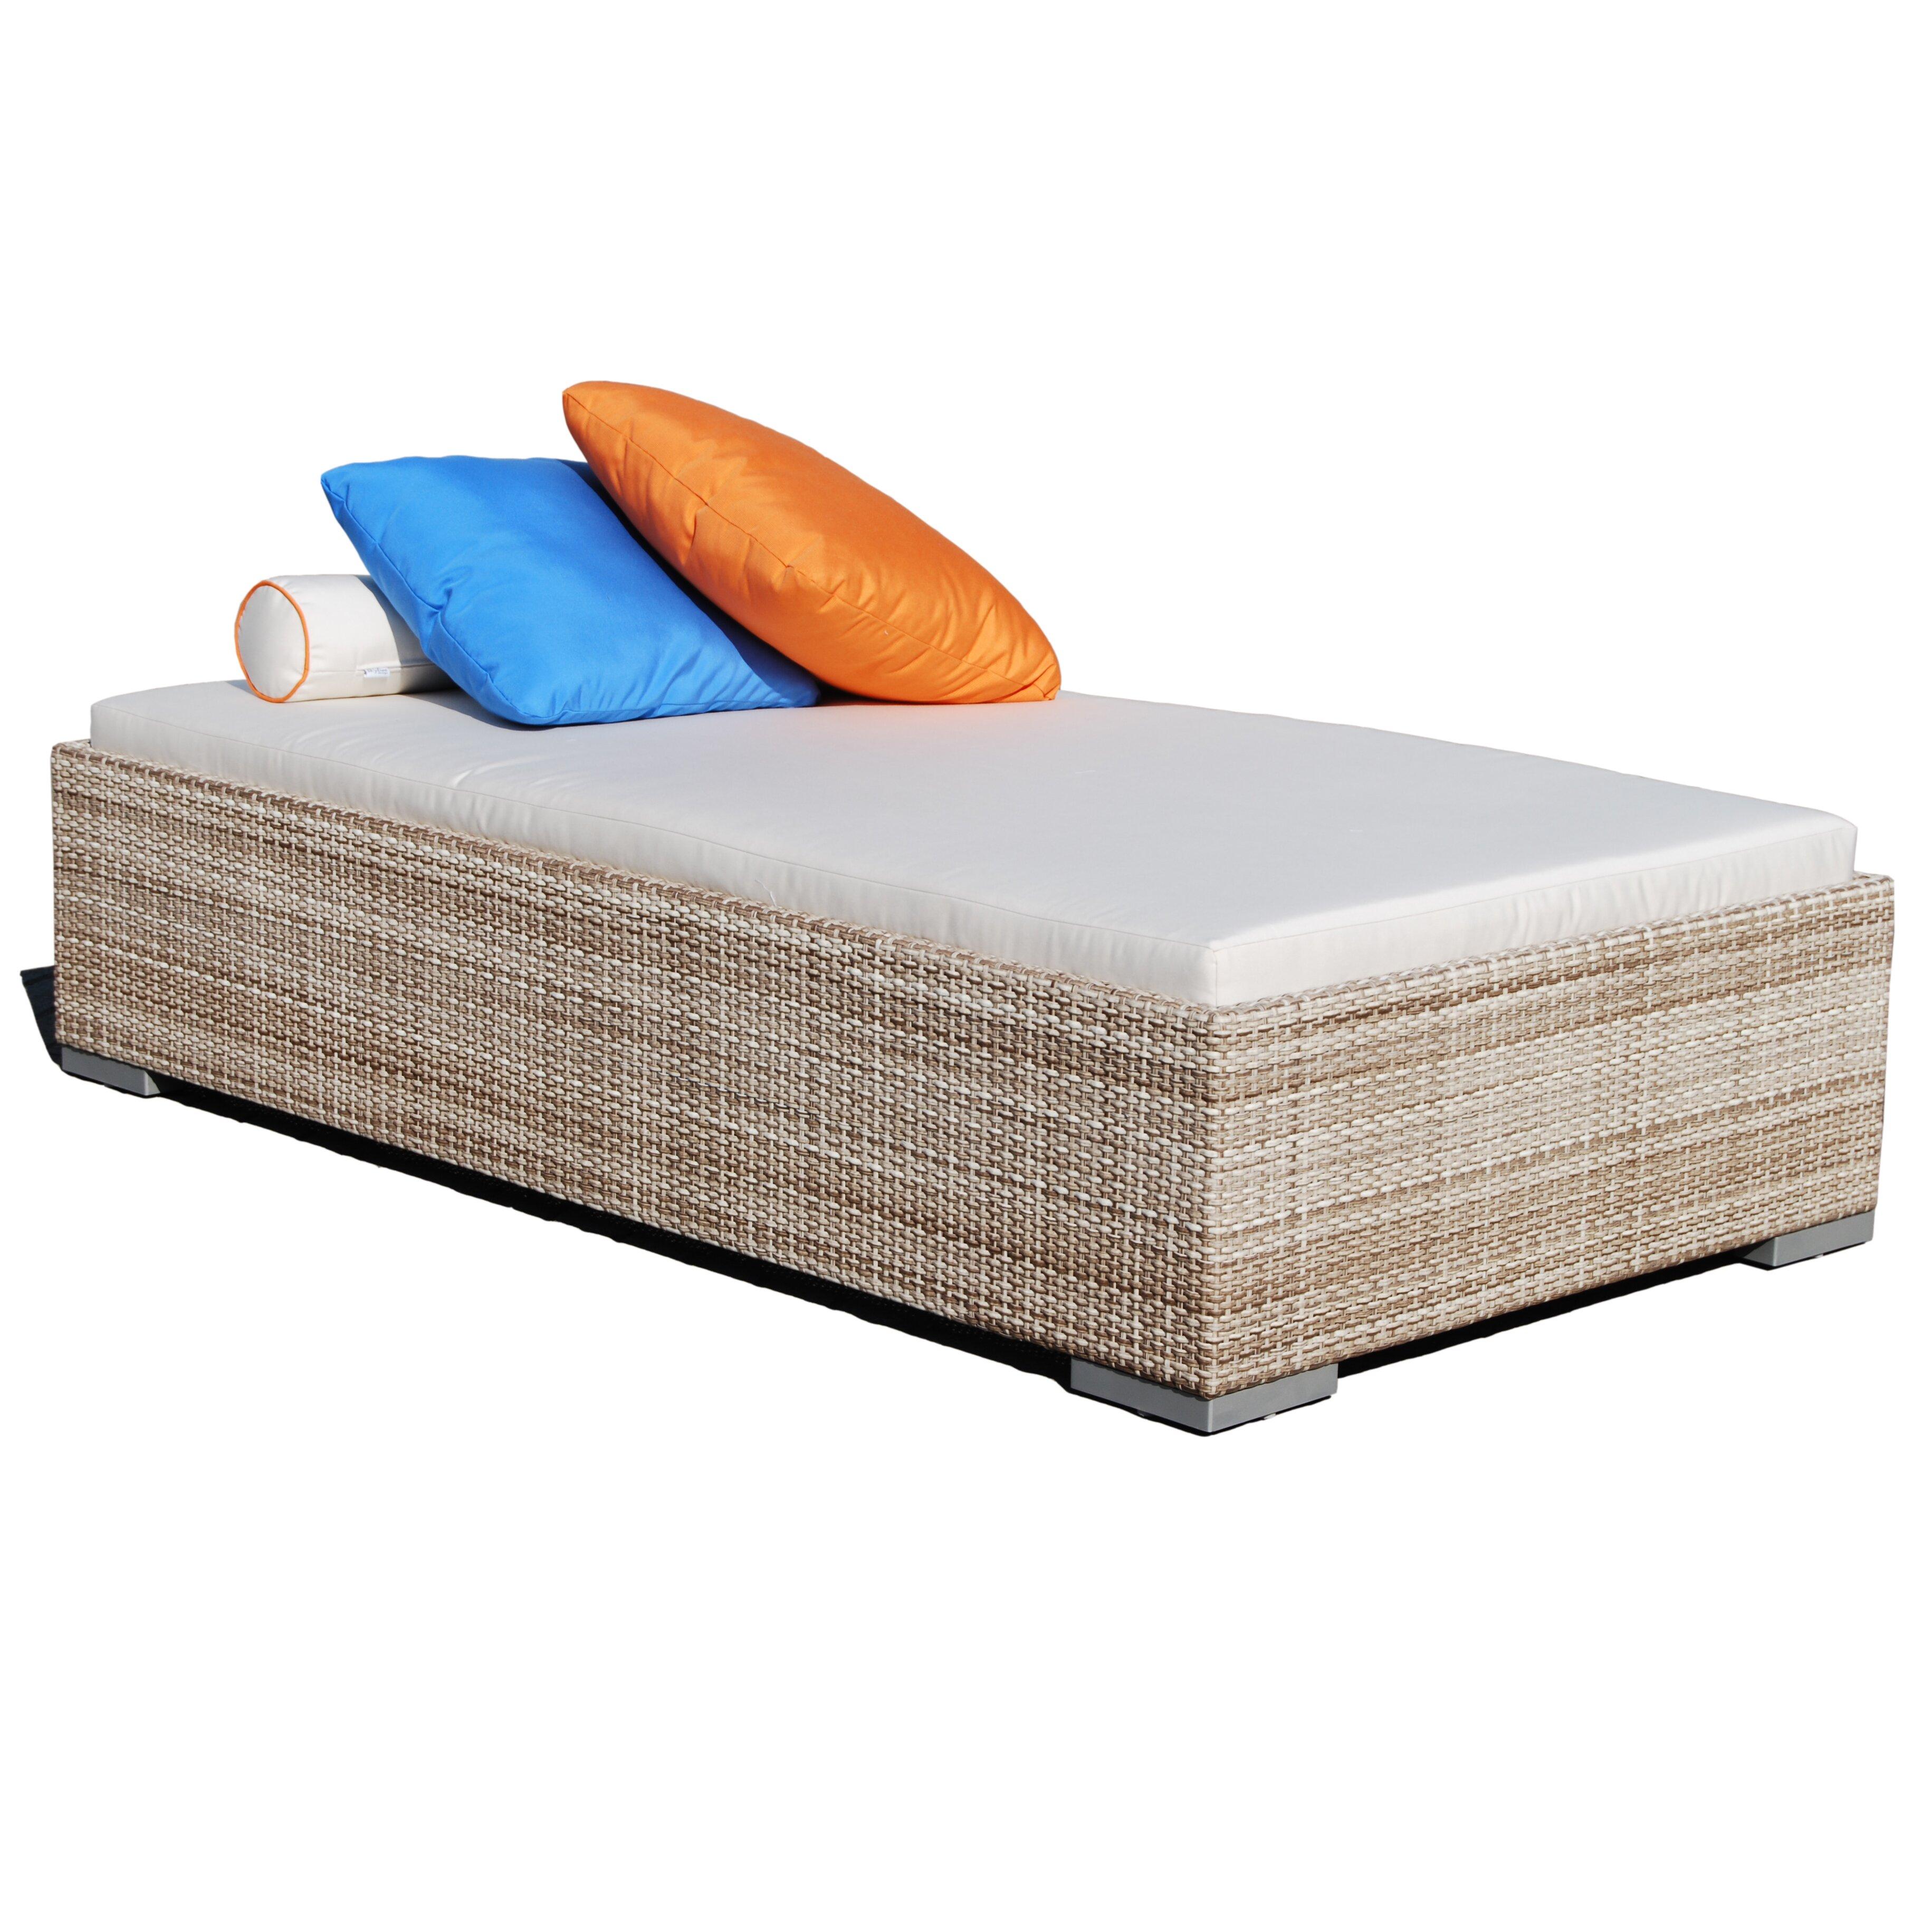 Dann foley brentwood chaise lounge with cushion wayfair for Chaise longue cushion